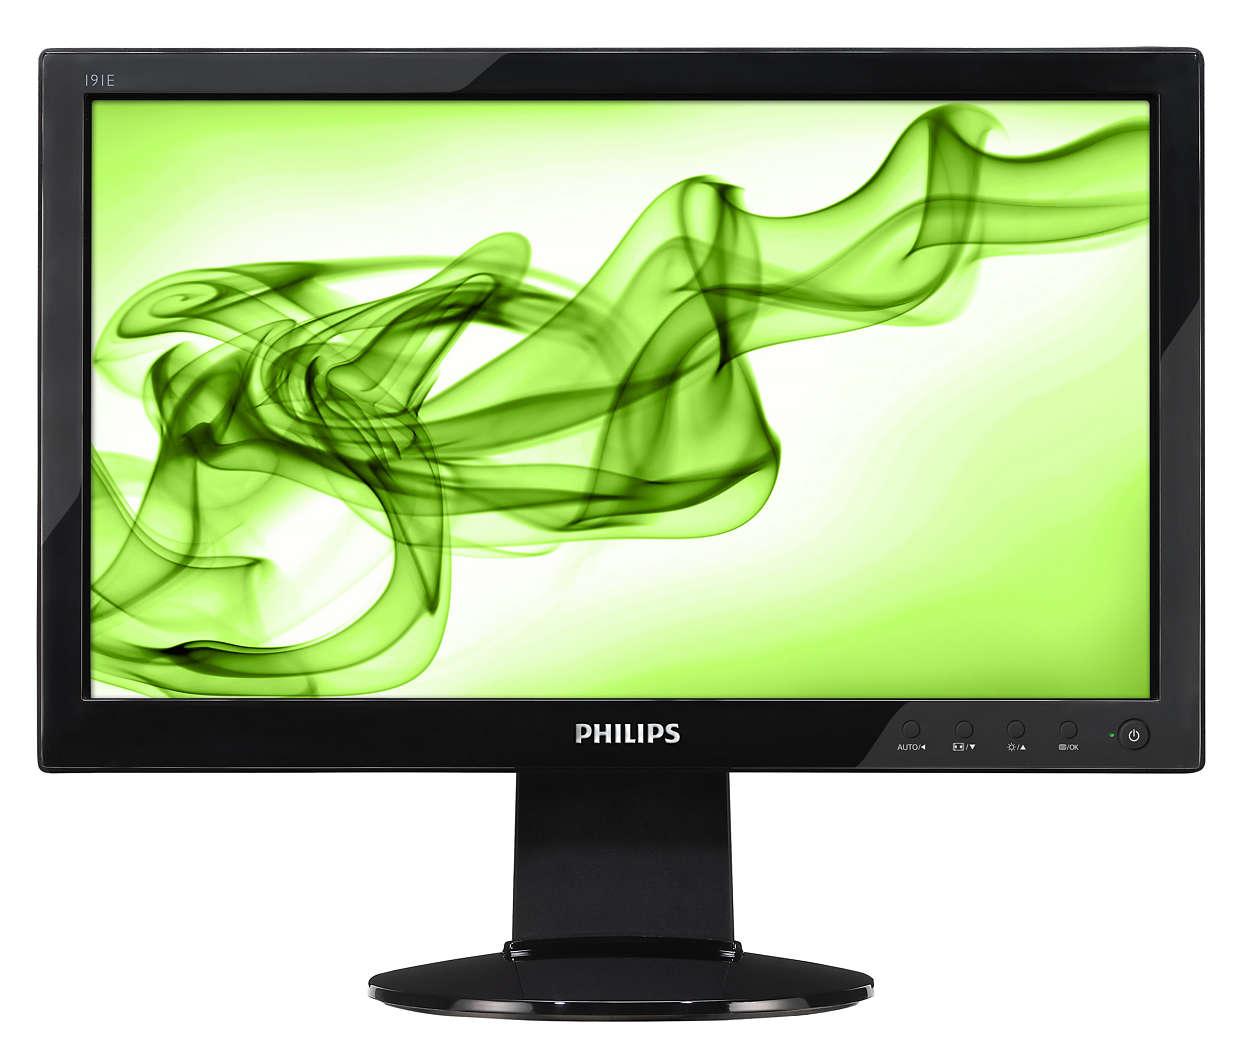 L'elegante display 16:9 HD offre funzioni di valore